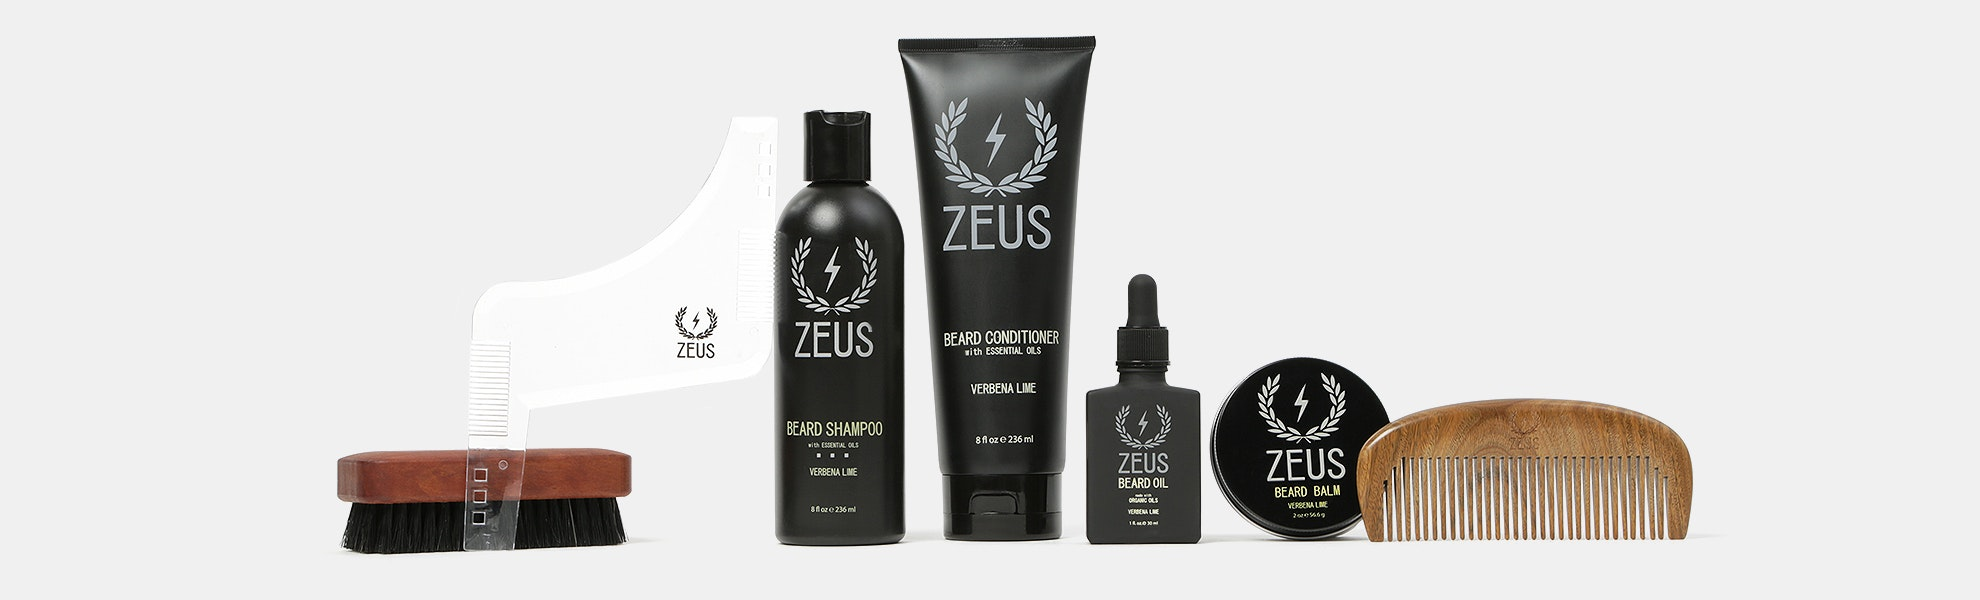 Zeus Beard Care & Grooming Set